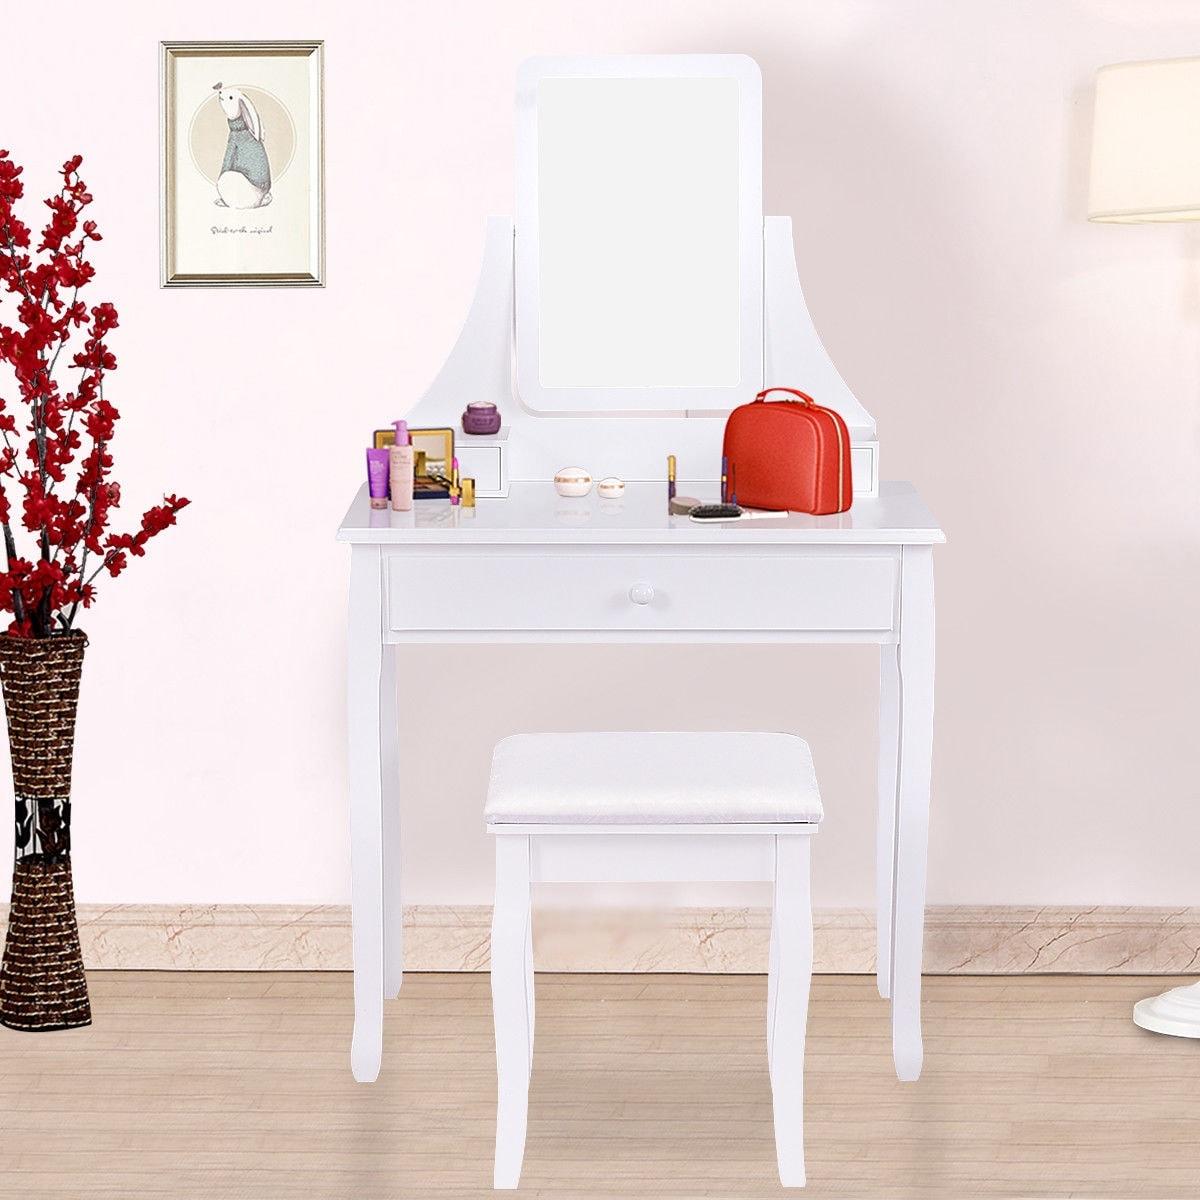 Gymax Bedroom Vanity Dressing Table Set W/ 3 Storage Boxes